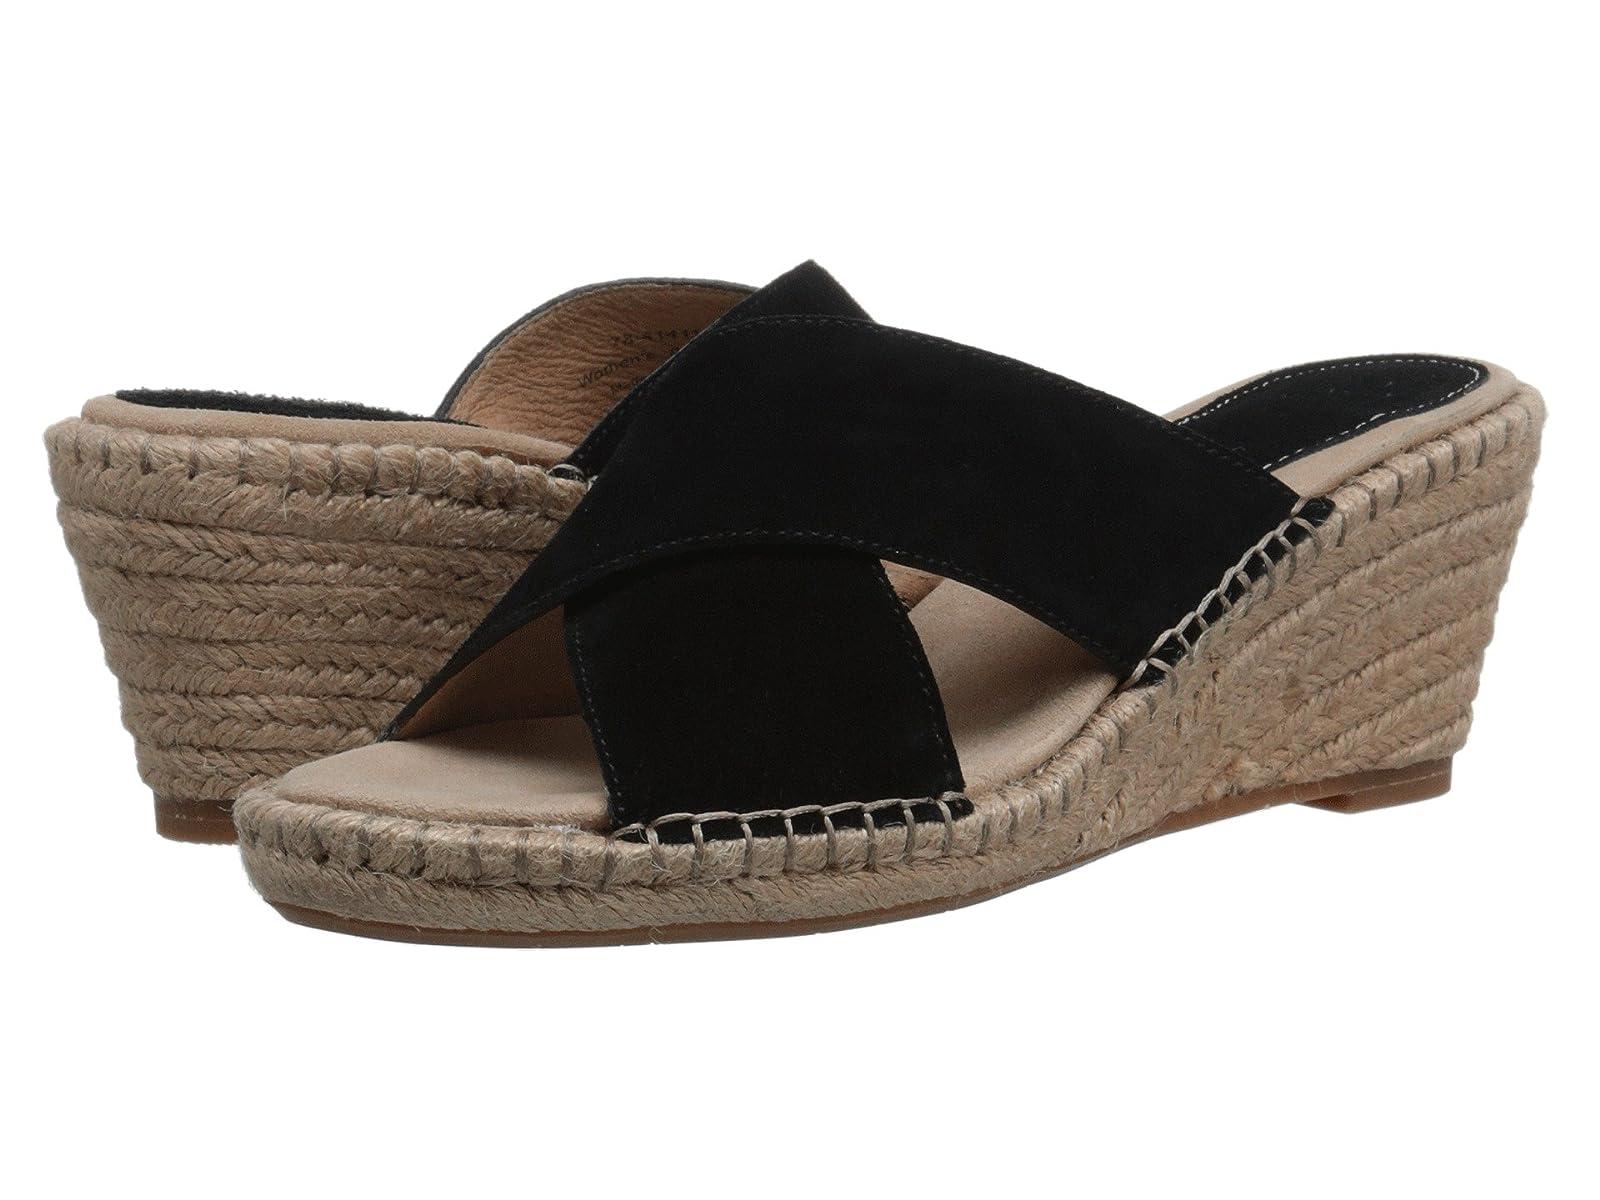 Johnston & Murphy Arlene Cross BandCheap and distinctive eye-catching shoes